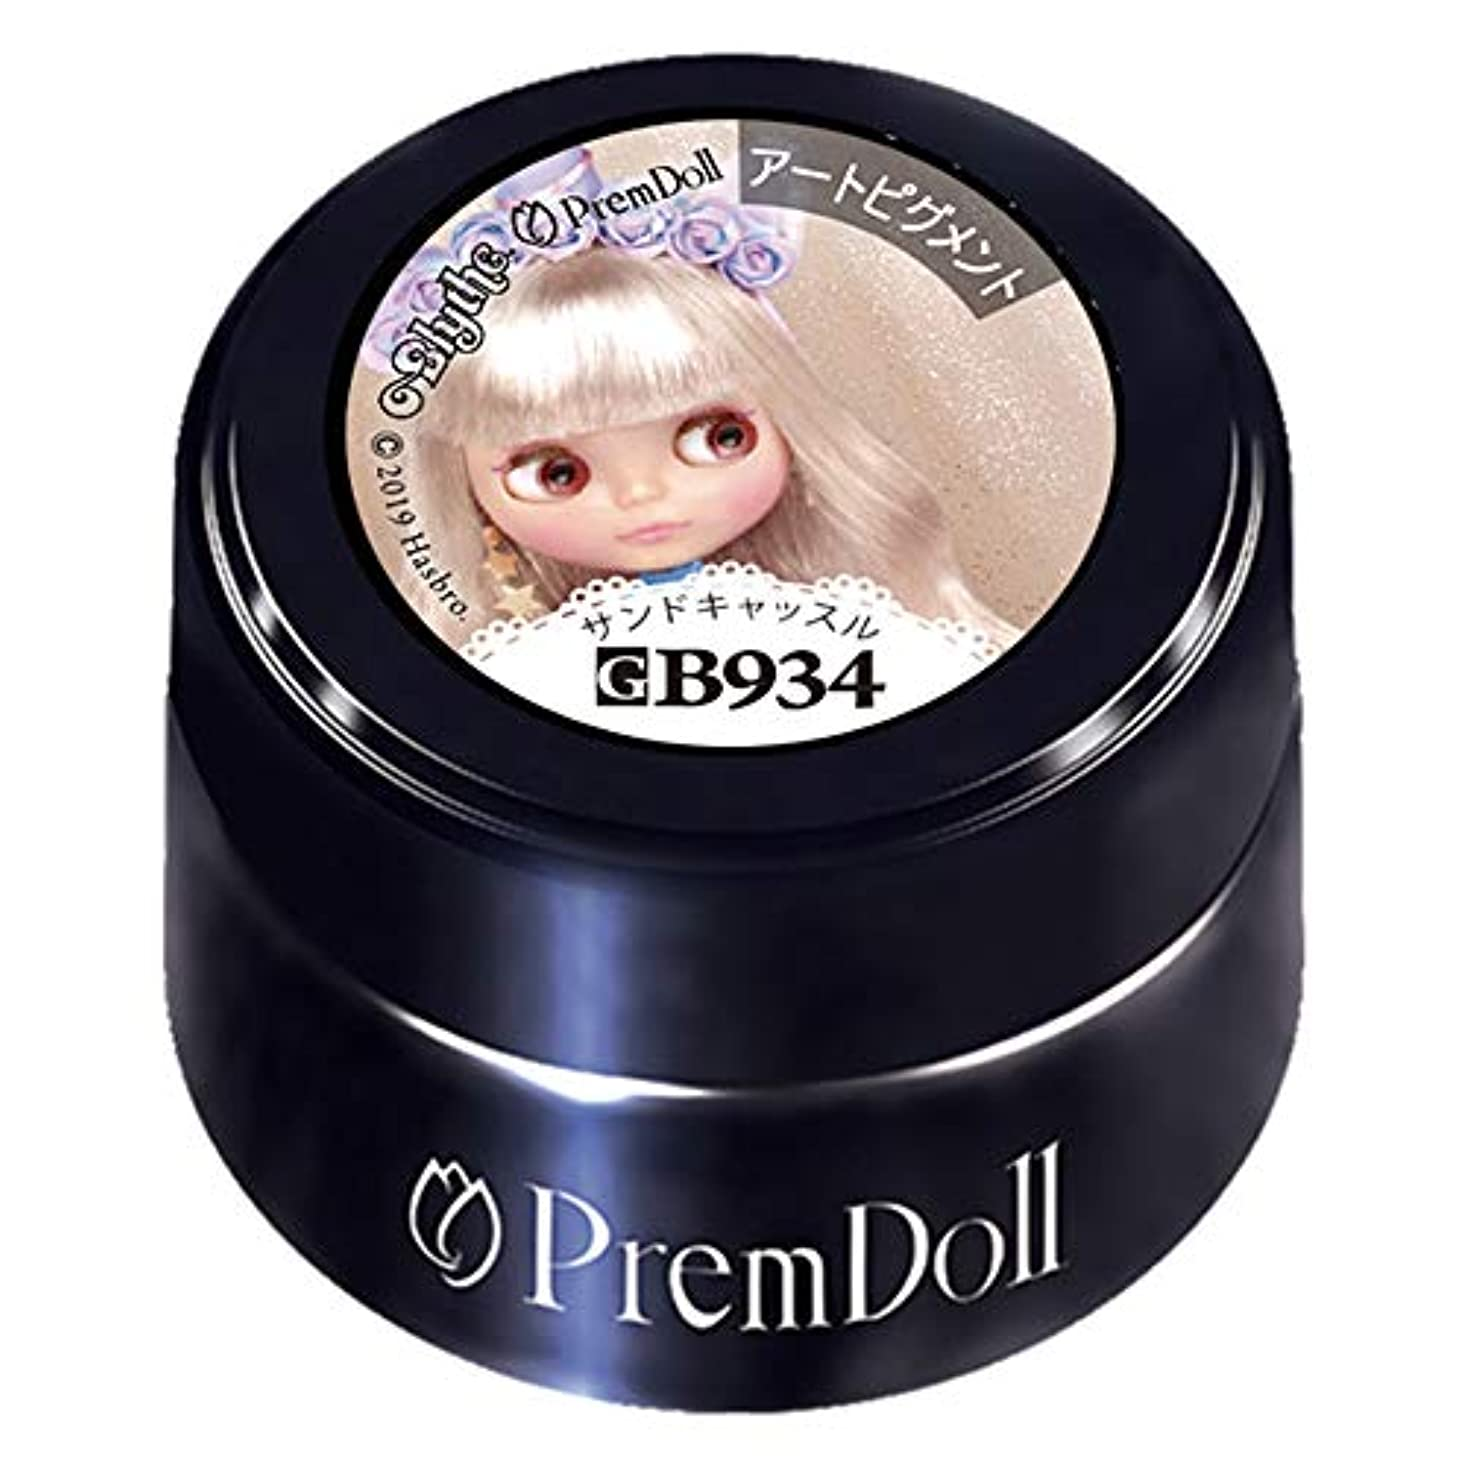 PRE GEL プリムドール サンドキャッスル 3g DOLL-B934 カラージェル UV/LED対応